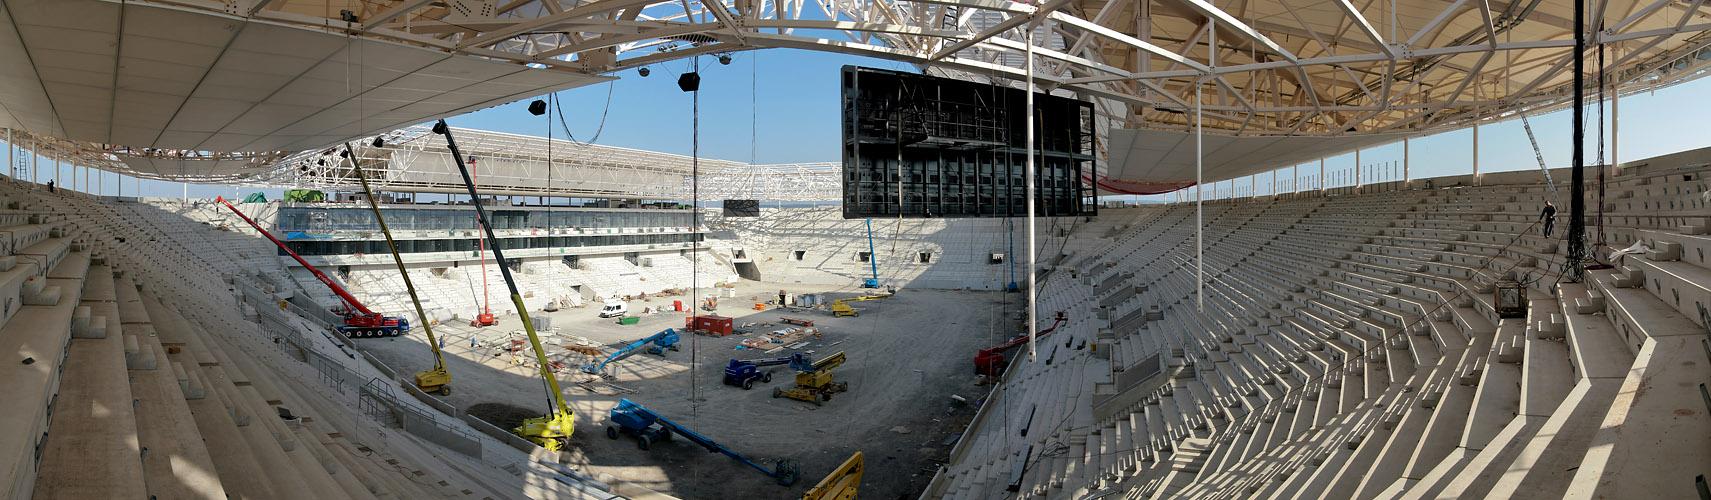 Rhein-Neckar Arena innendrinnen